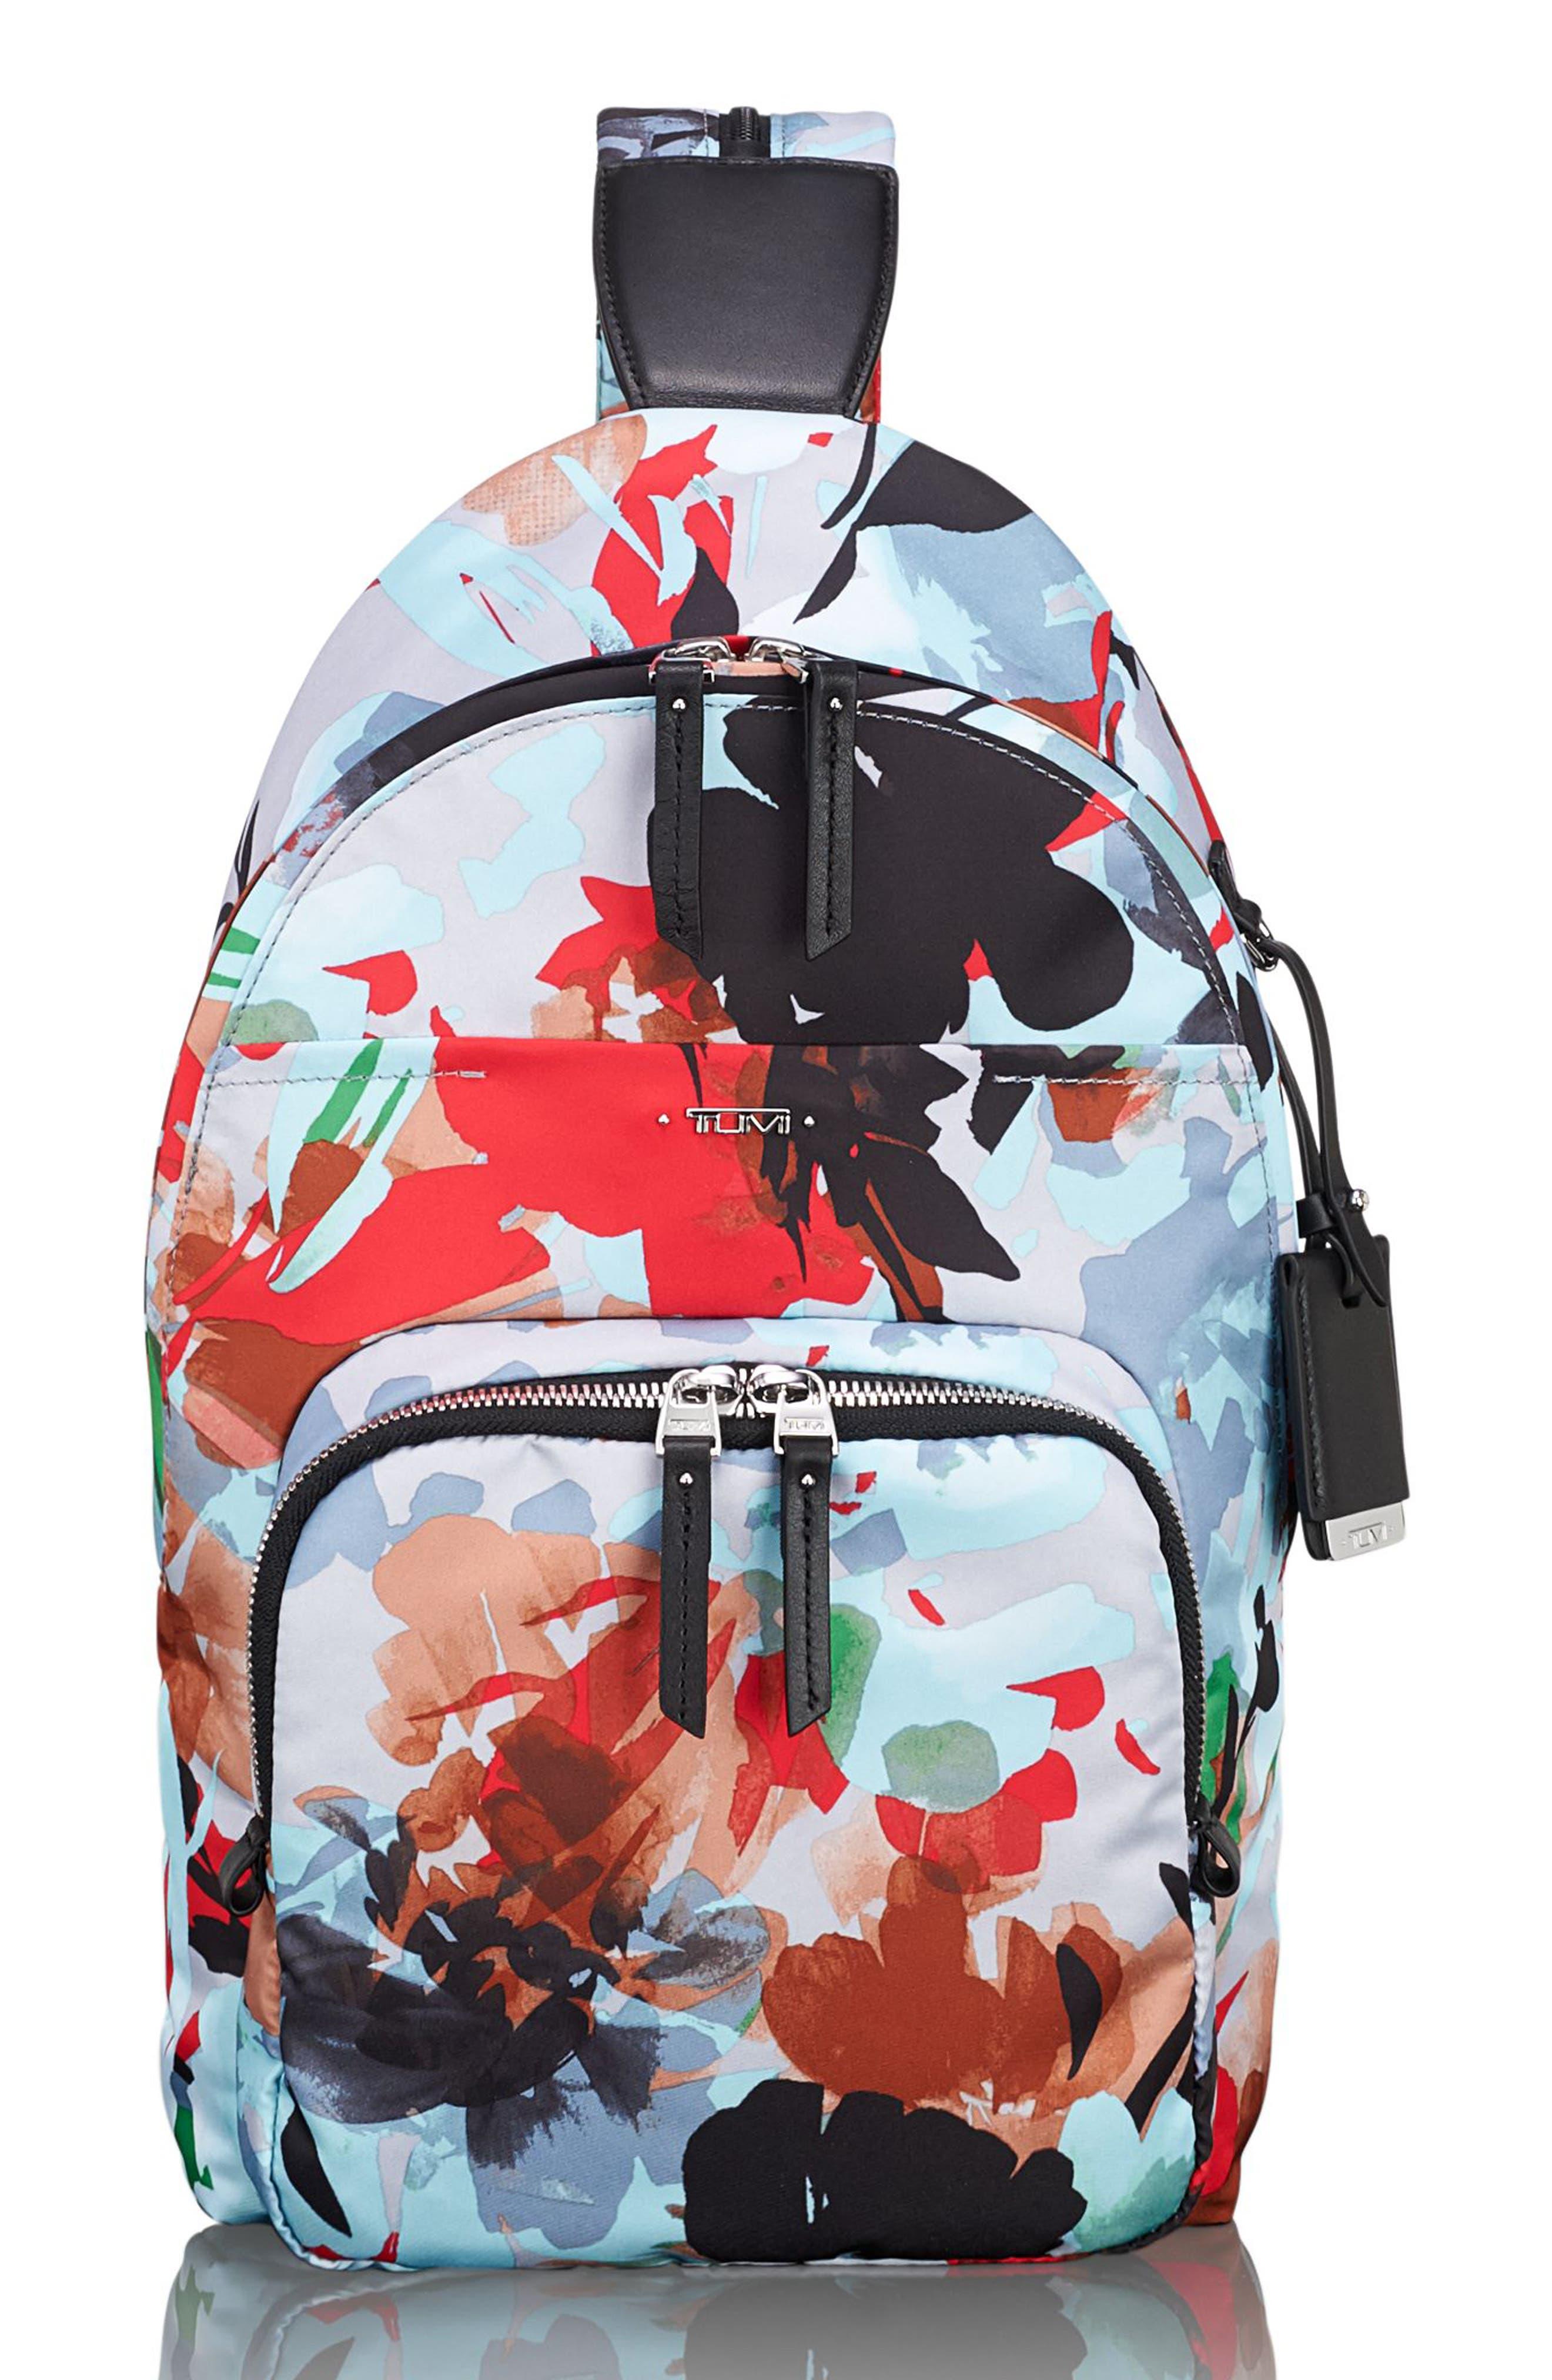 Alternate Image 1 Selected - Tumi Nadia Convertible Backpack